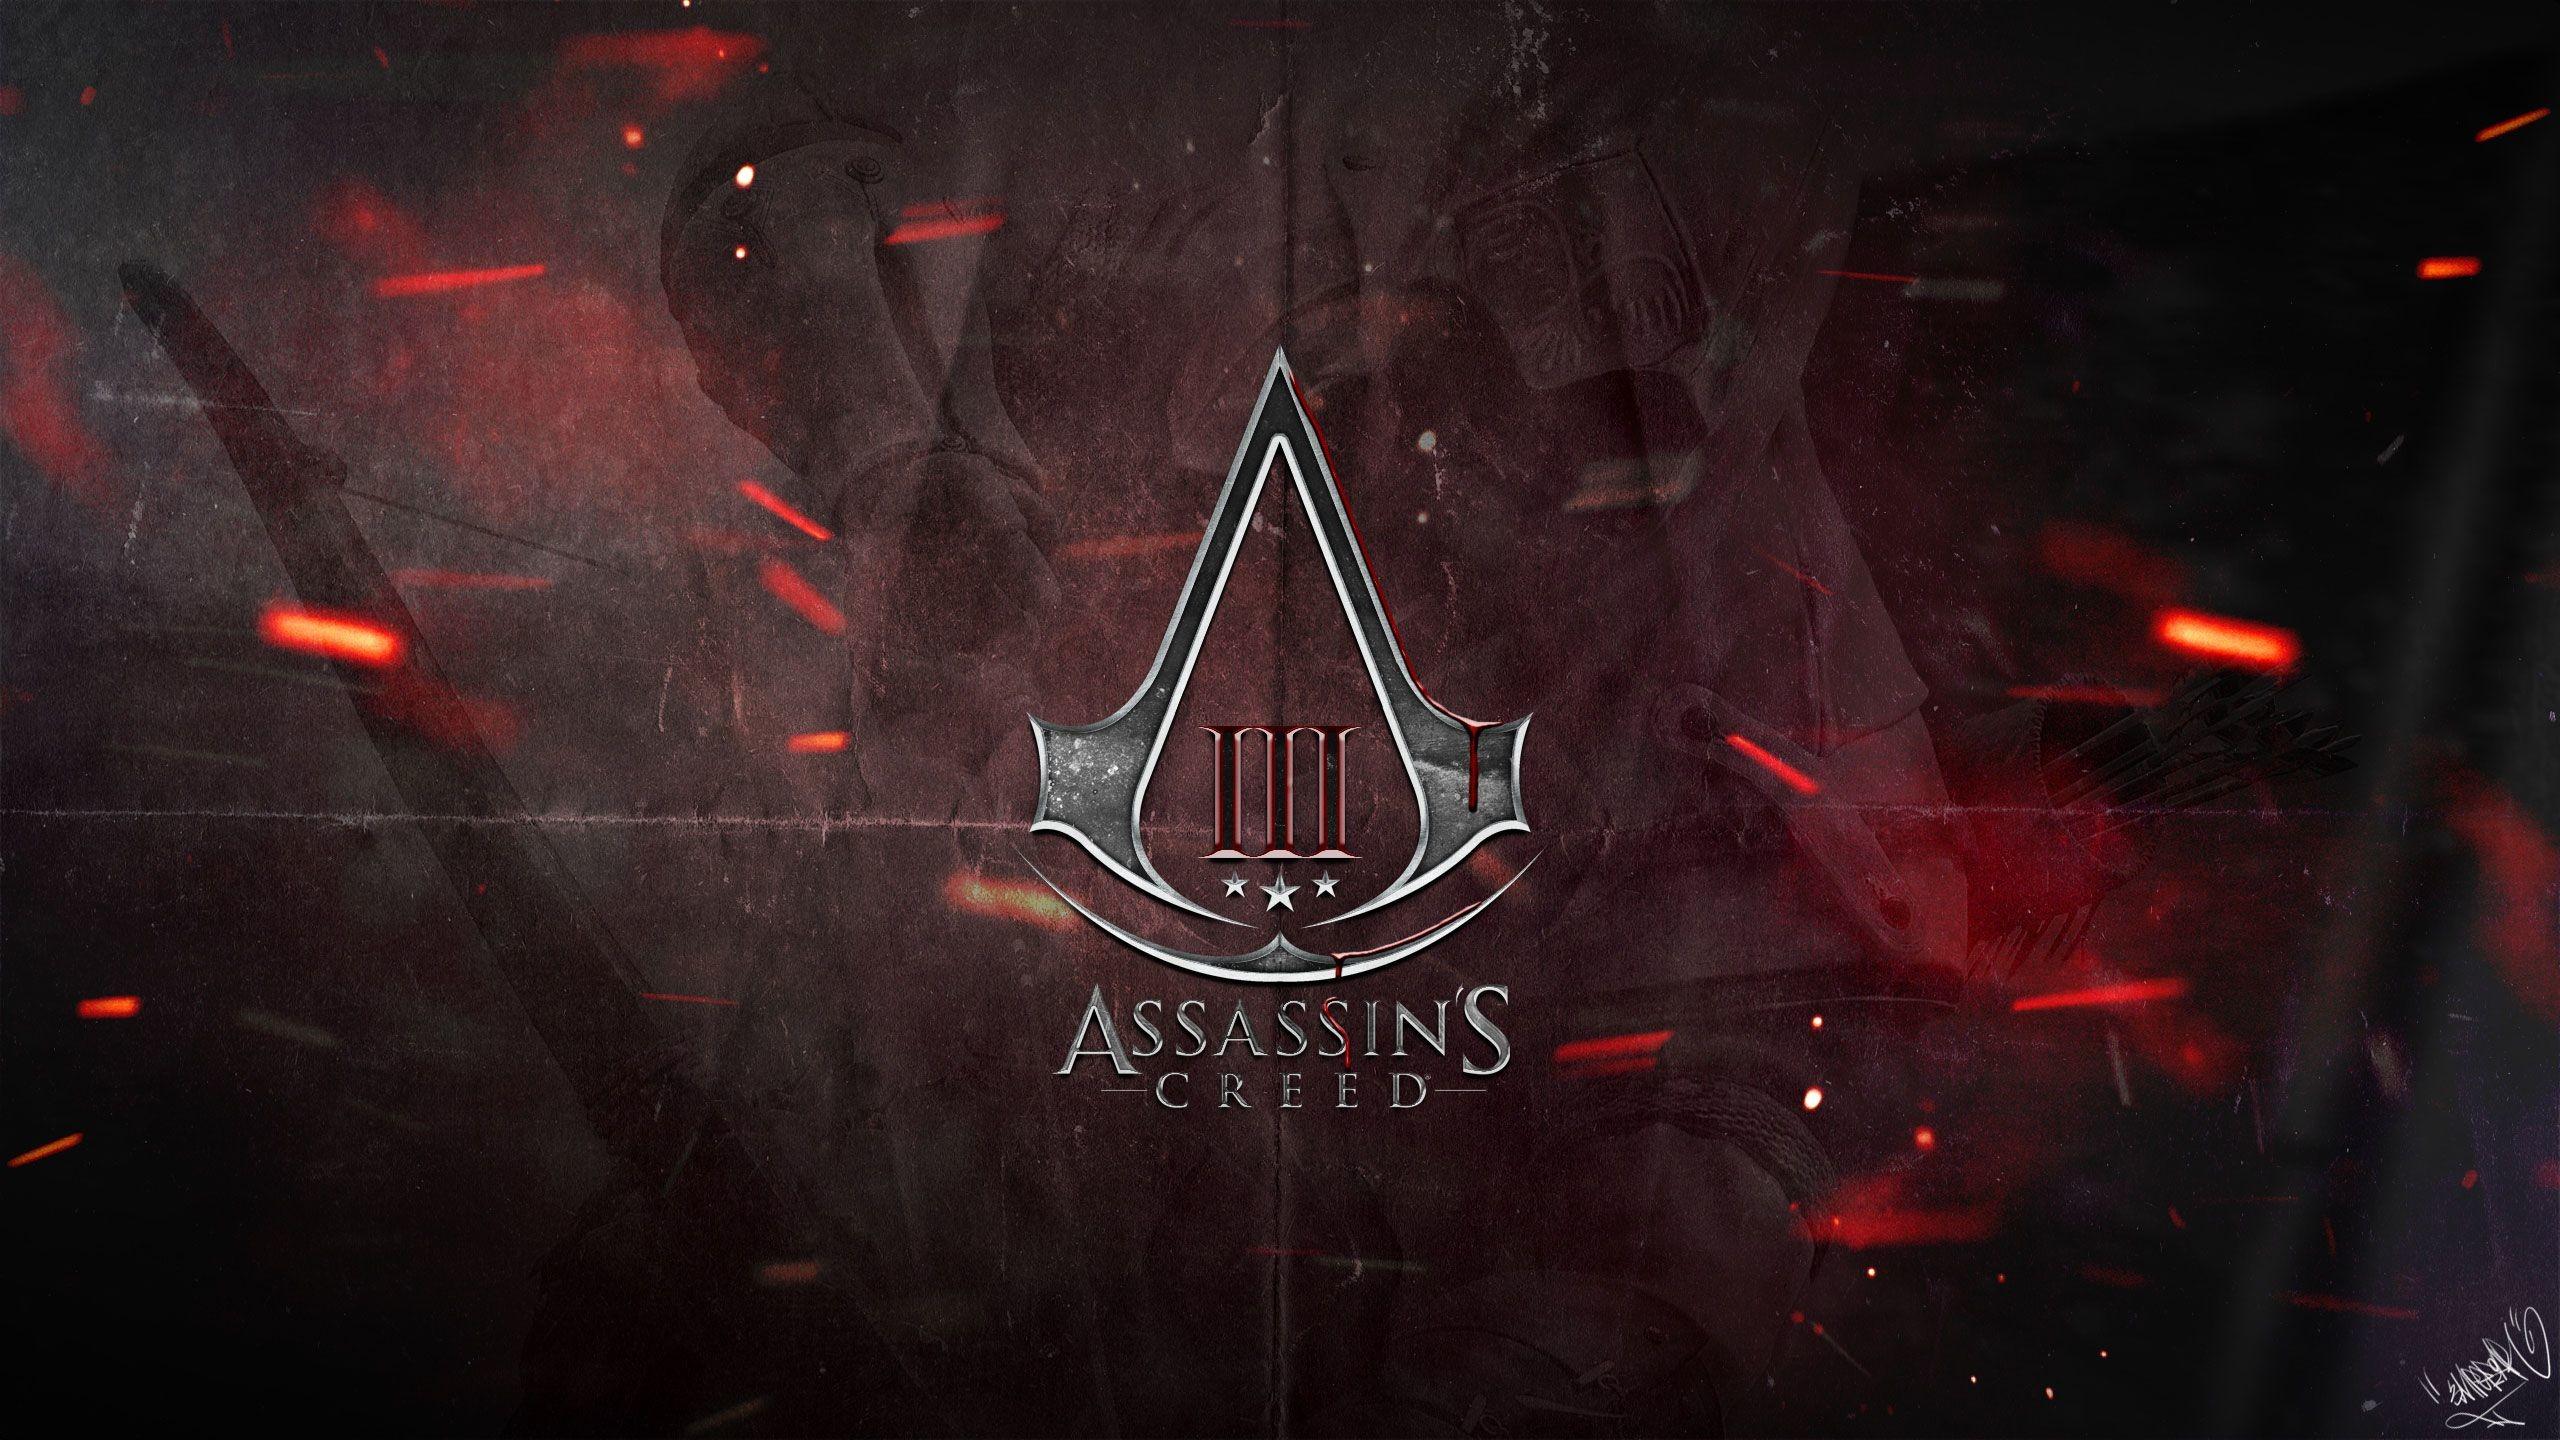 … Assassins Creed Logo Wallpaper #6874086 …